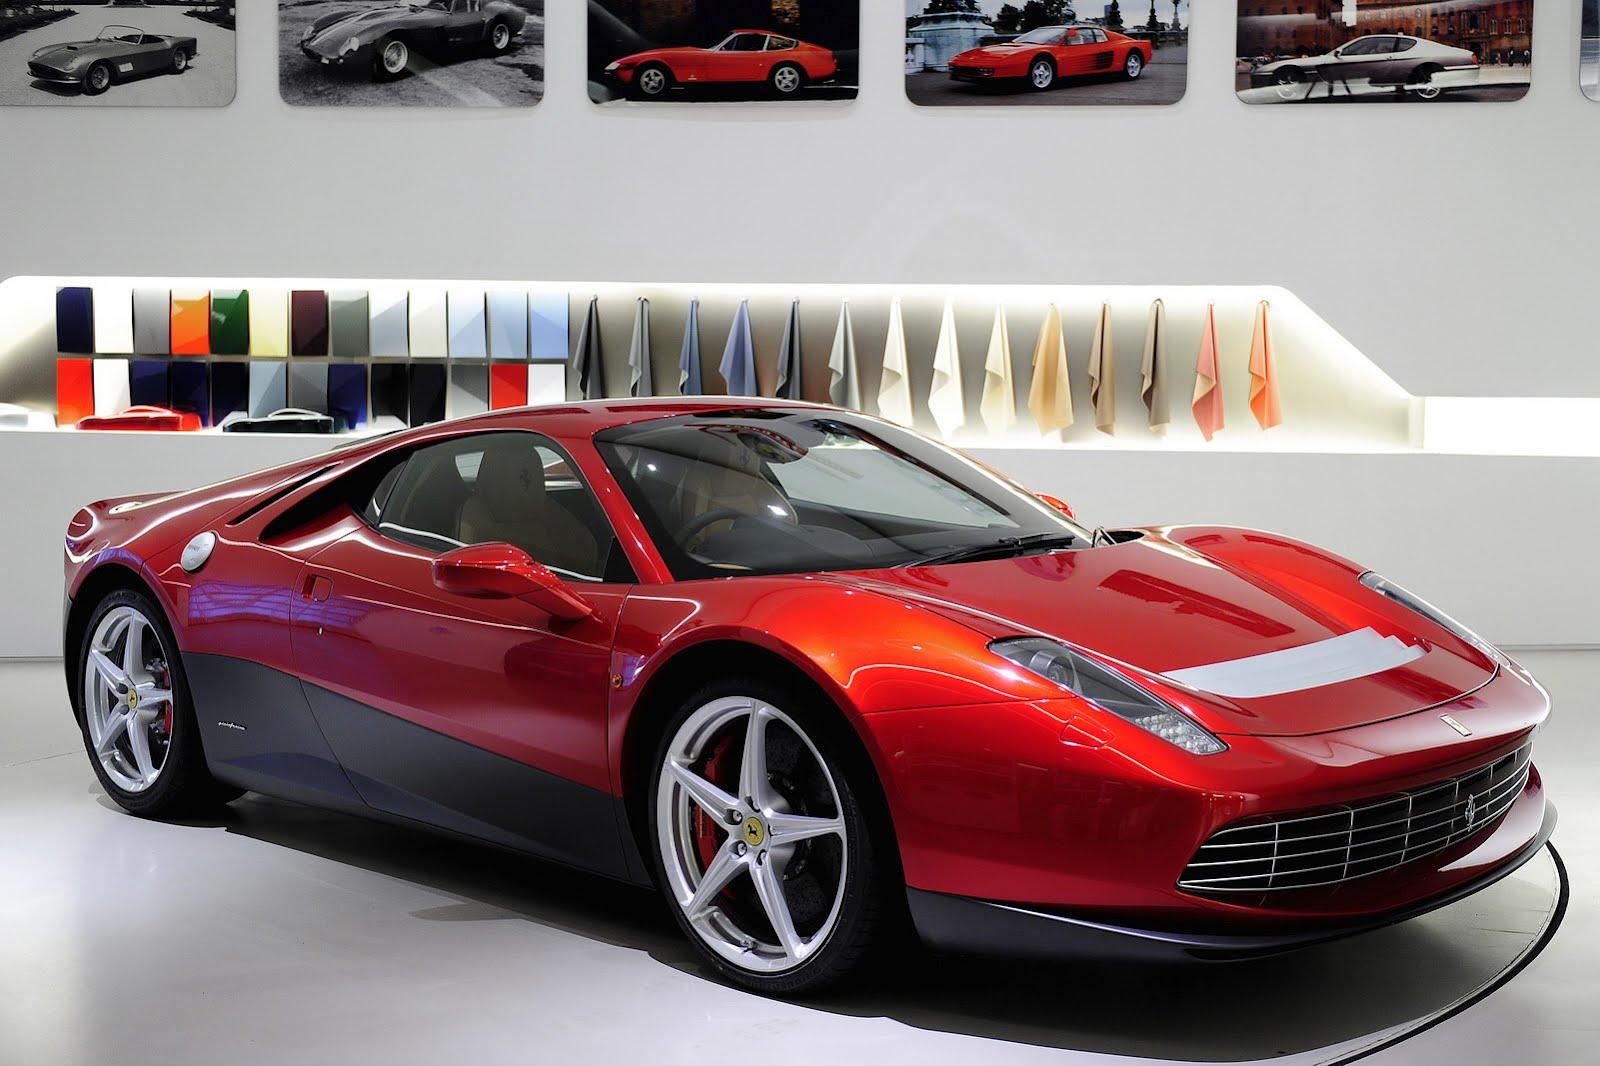 http://2.bp.blogspot.com/-jG4cGawsrtk/T8Cg3noZAyI/AAAAAAAAgkw/Fi97-frmCac/s1600/Ferrari-SP12-EC-2.jpg